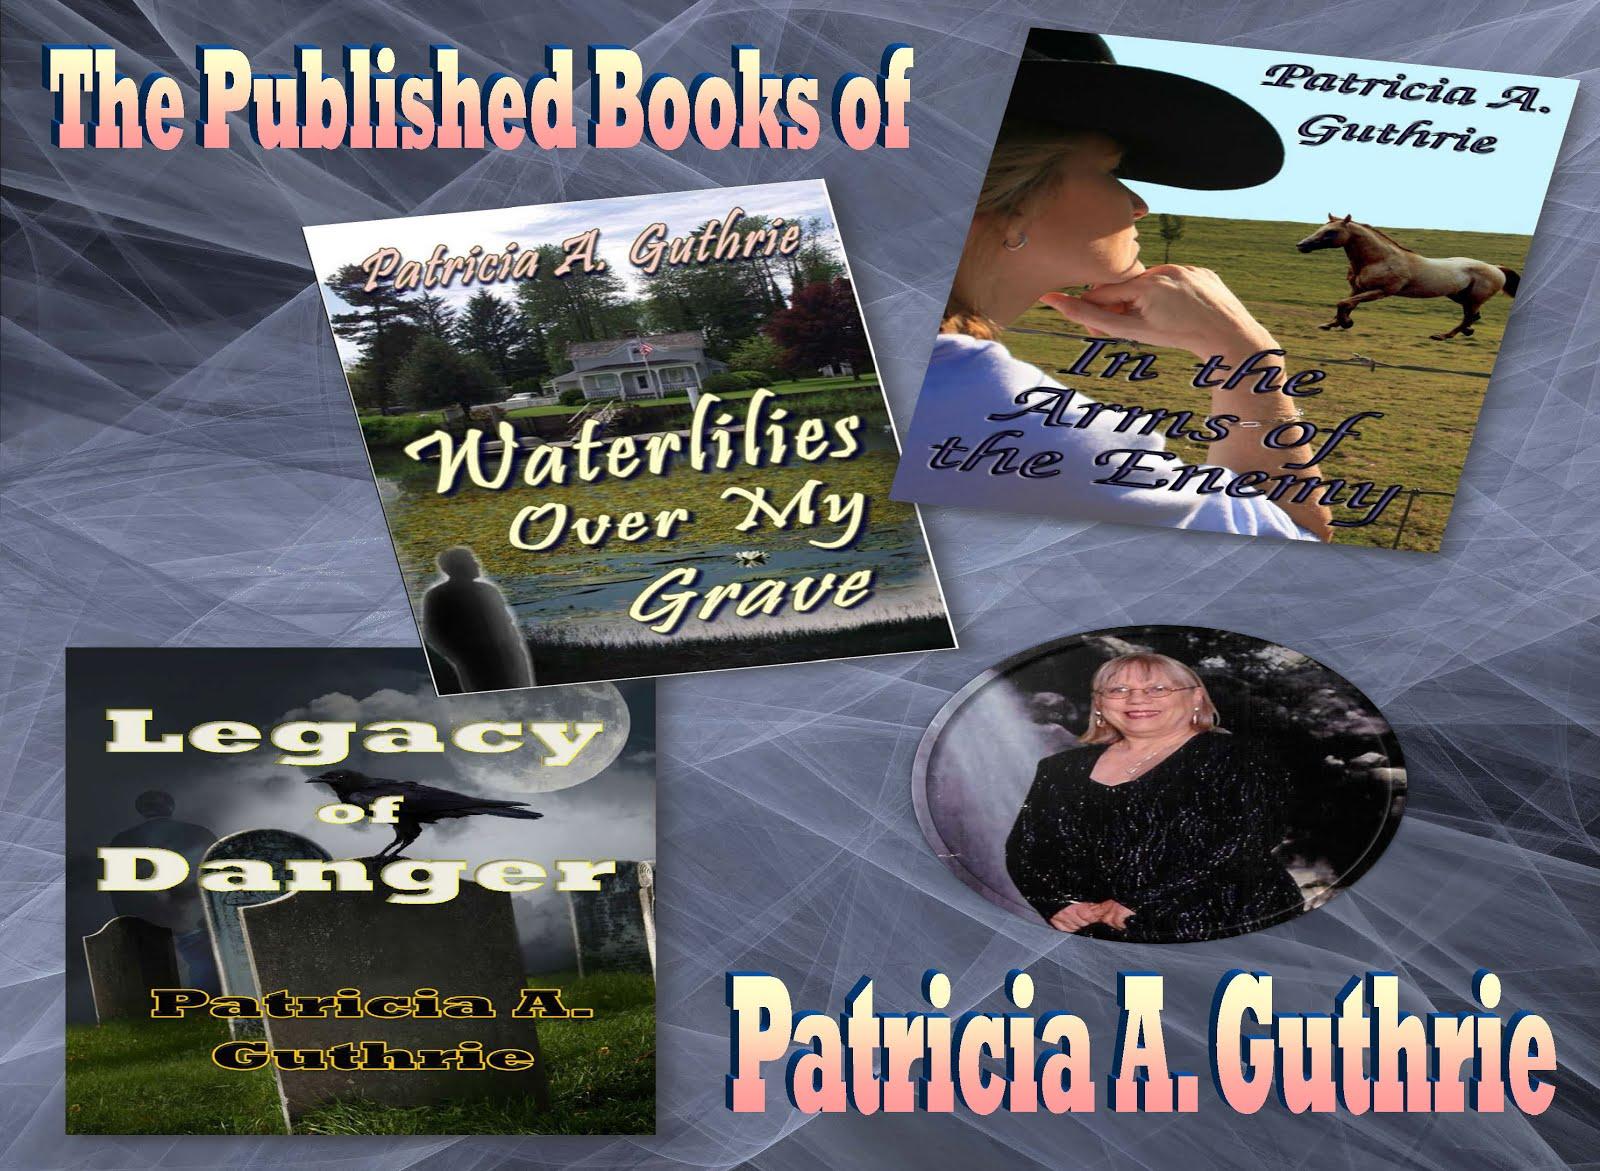 Author, Patricia A. Guthrie